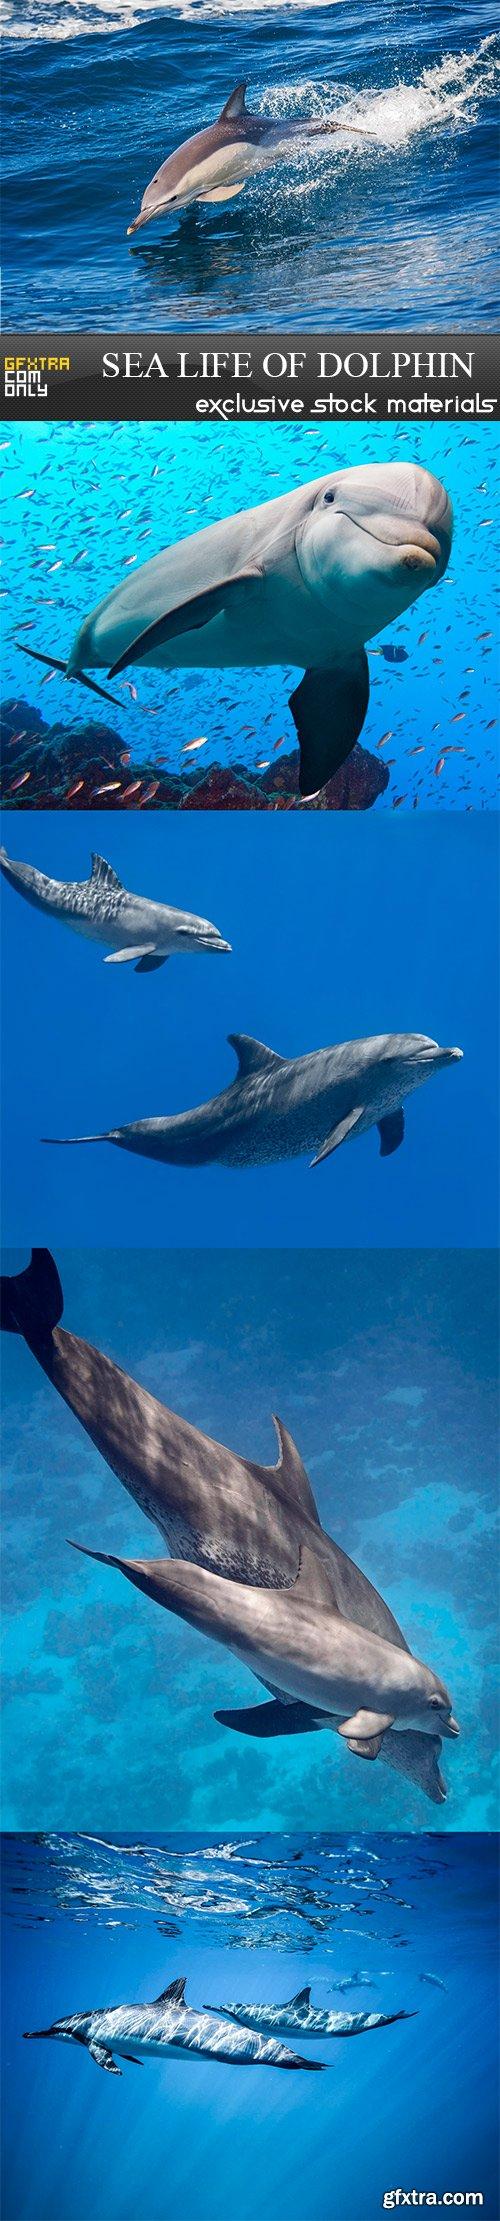 Sea life of dolphin - 5 UHQ JPEG